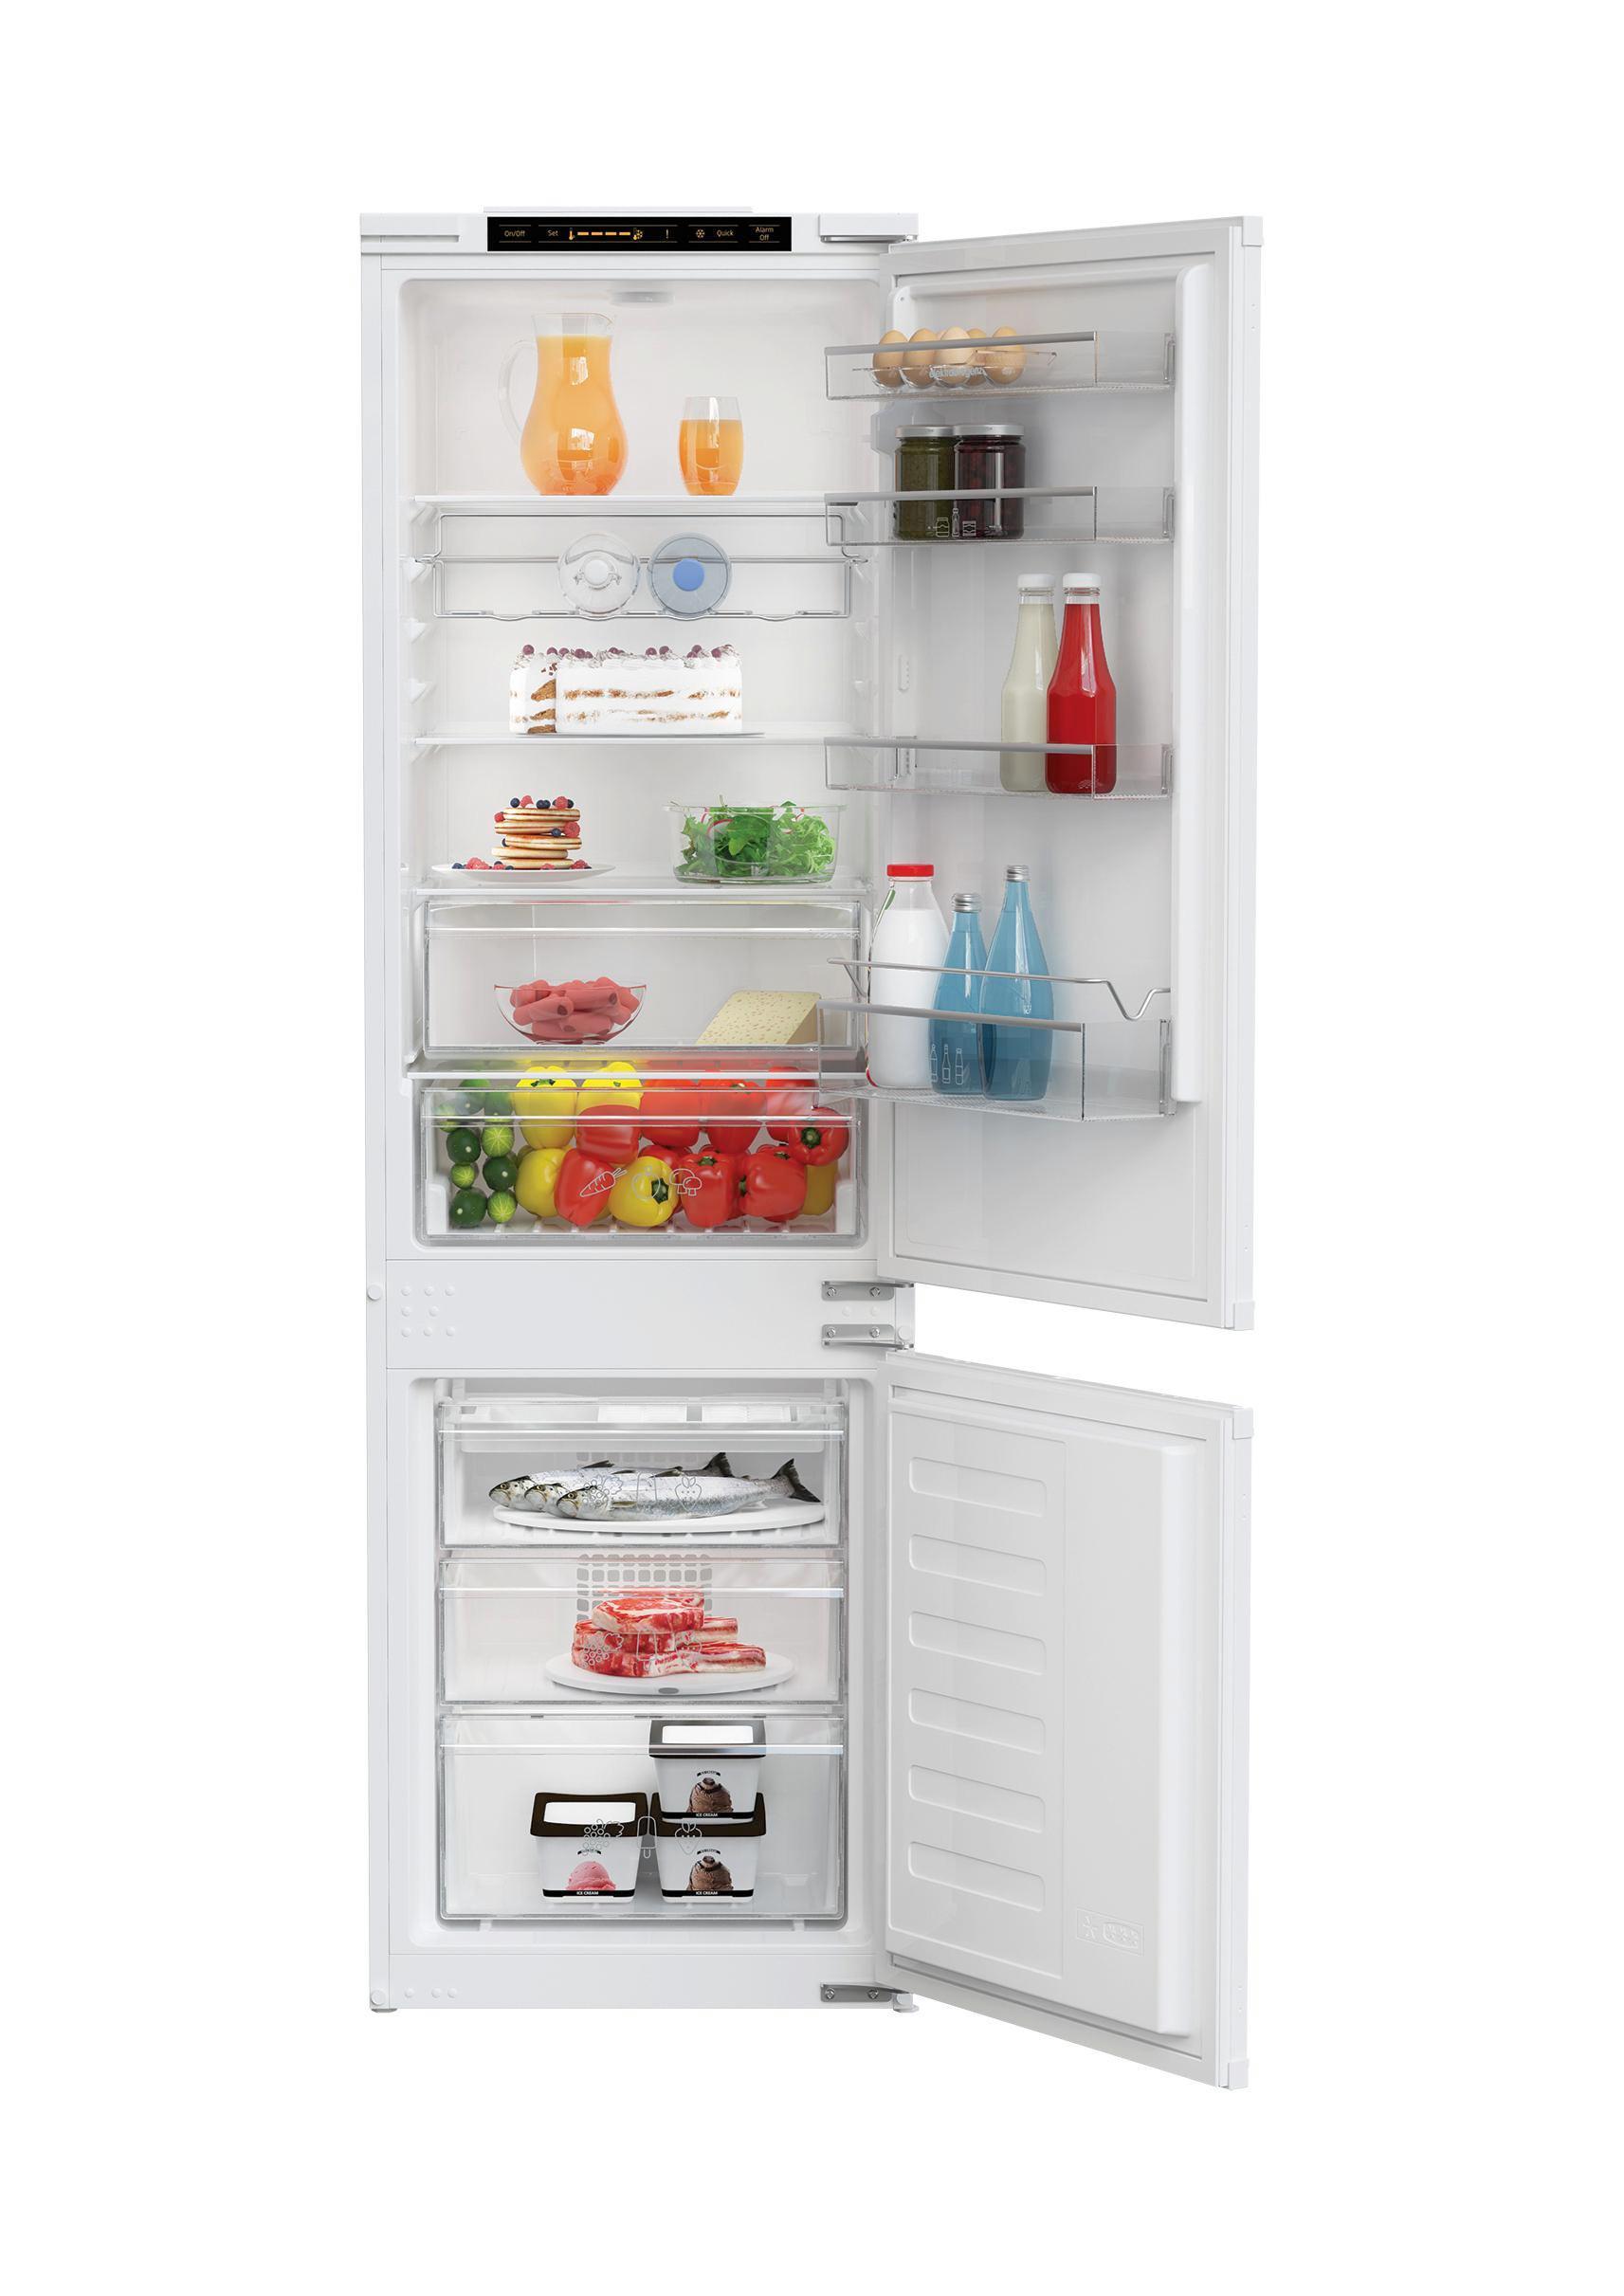 Kühlschrank Kombi : Kühl gefrier kombination mk kib online kaufen ➤ möbelix